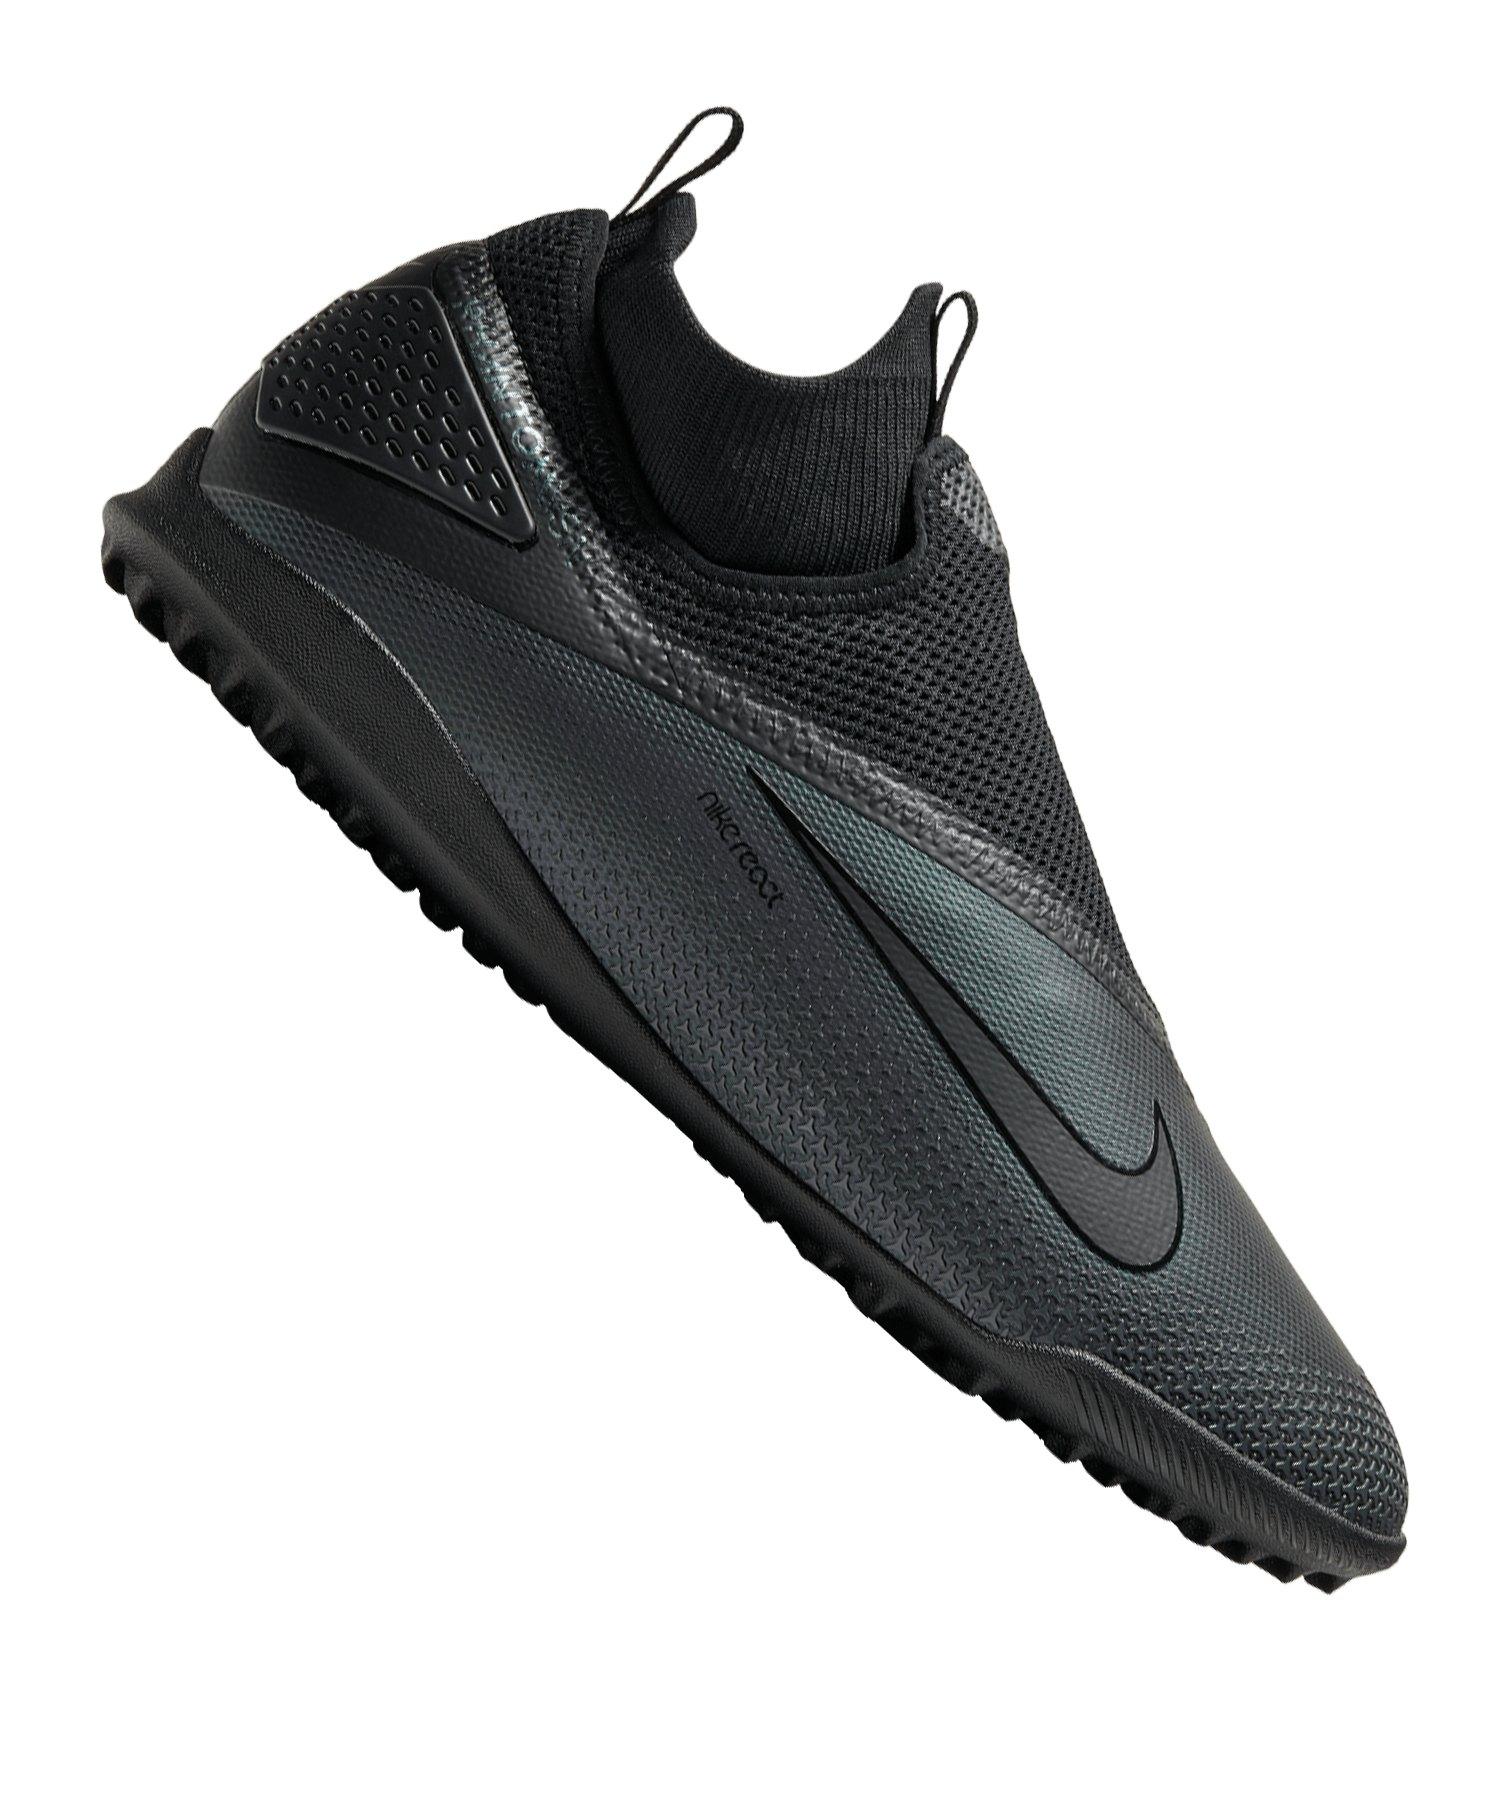 Nike Phantom React Vision II Kinetic Black Pro TF Schwarz F010 - schwarz